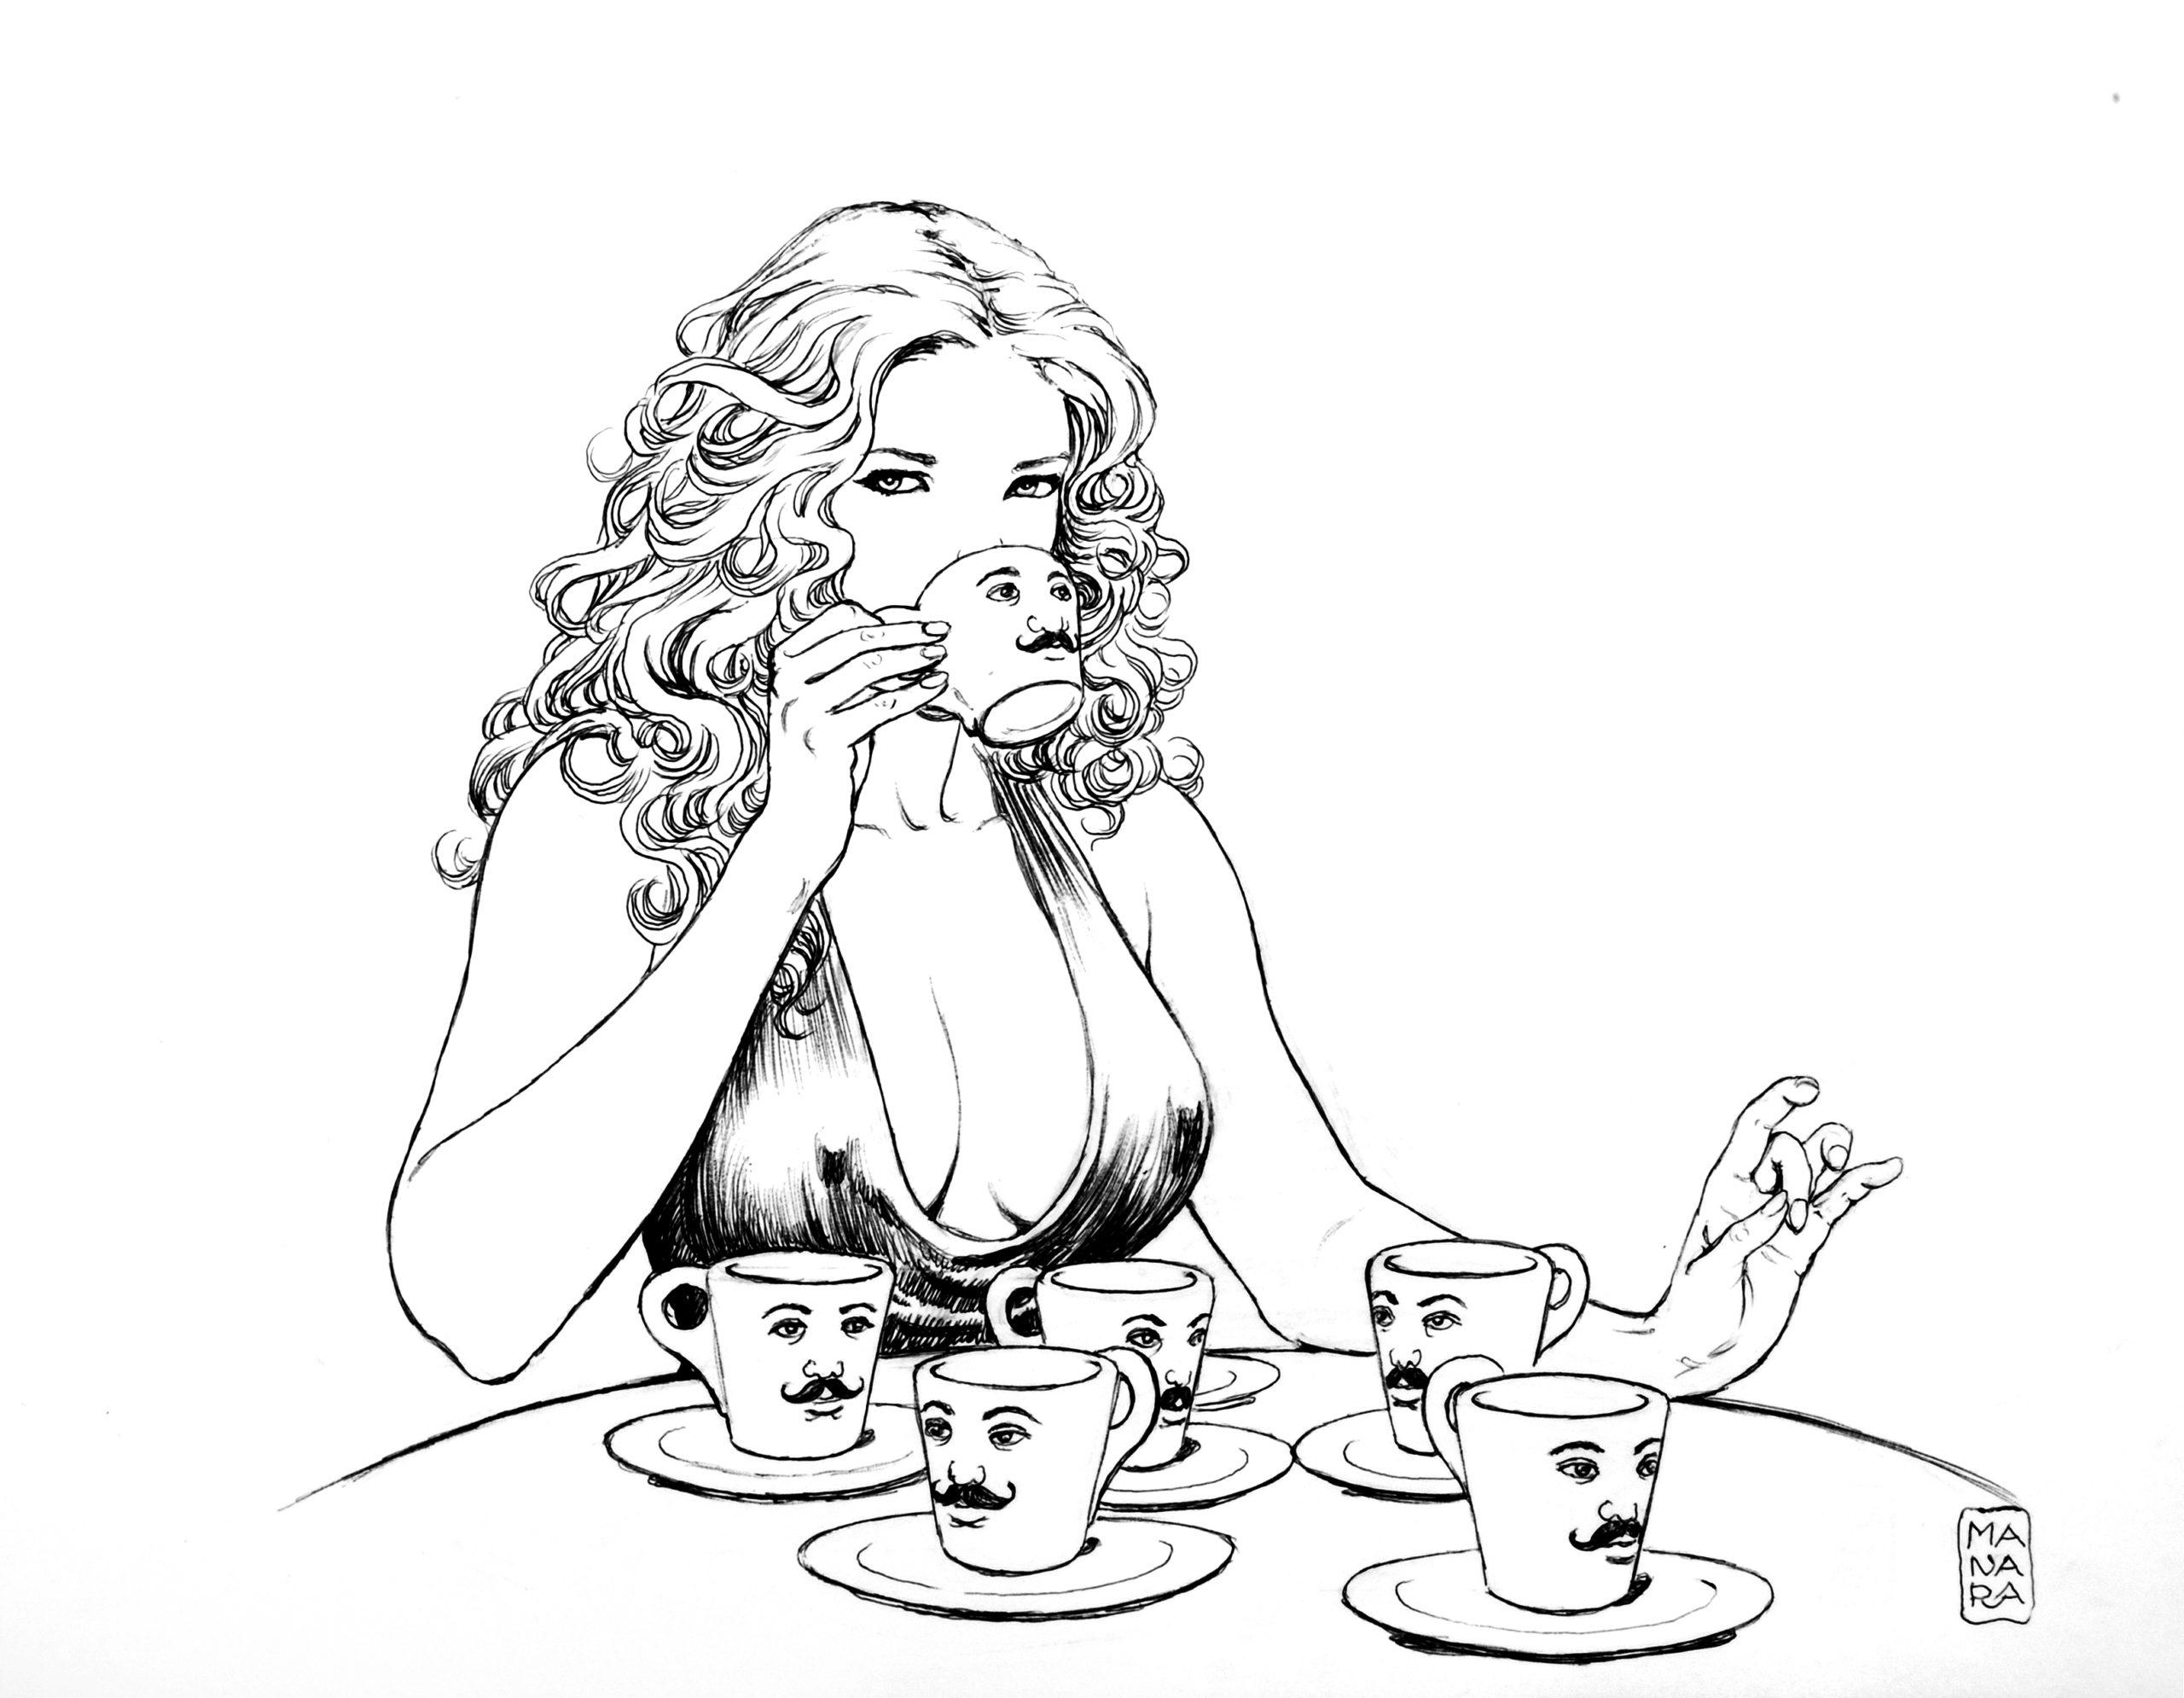 Manara Lavazza. Caffè coi baffi.